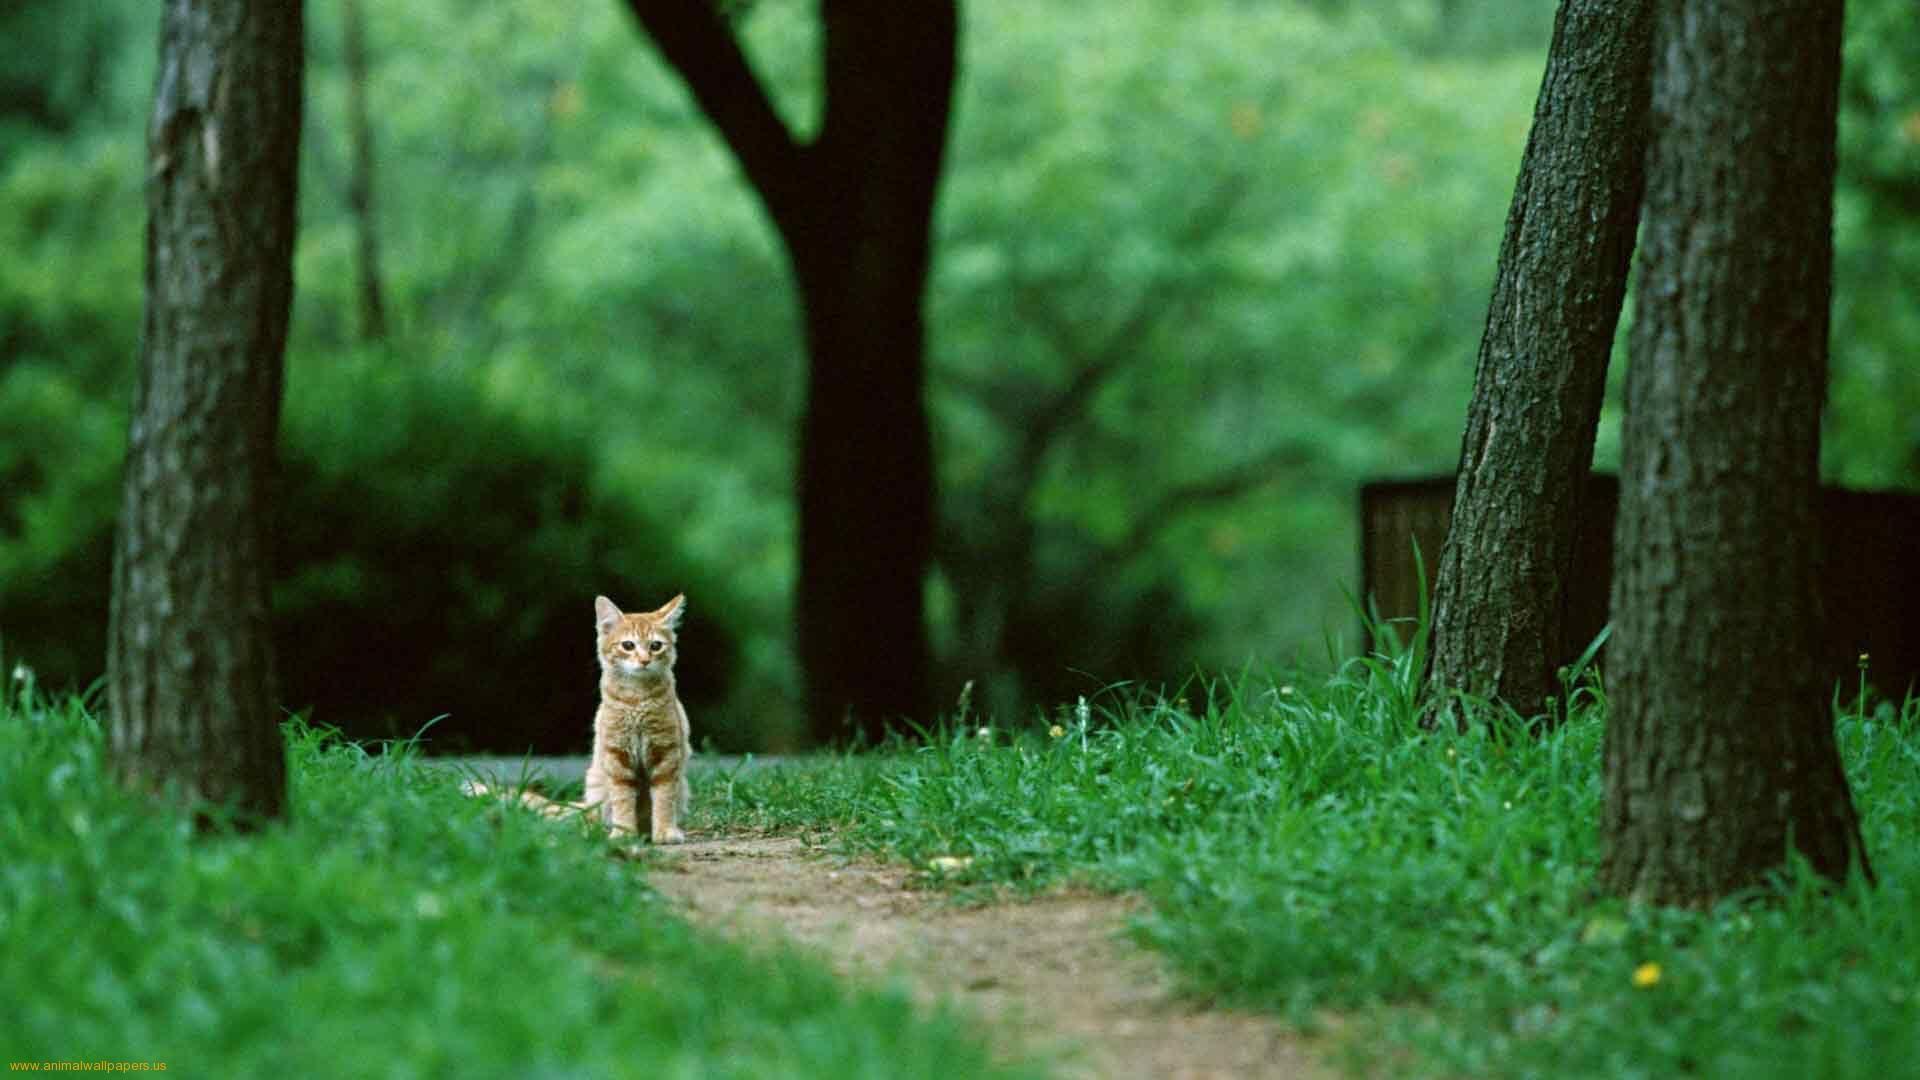 Chromebook Backgrounds 26330 High Resolution Slowall Com Animal Wallpaper Animals Cat Wallpaper